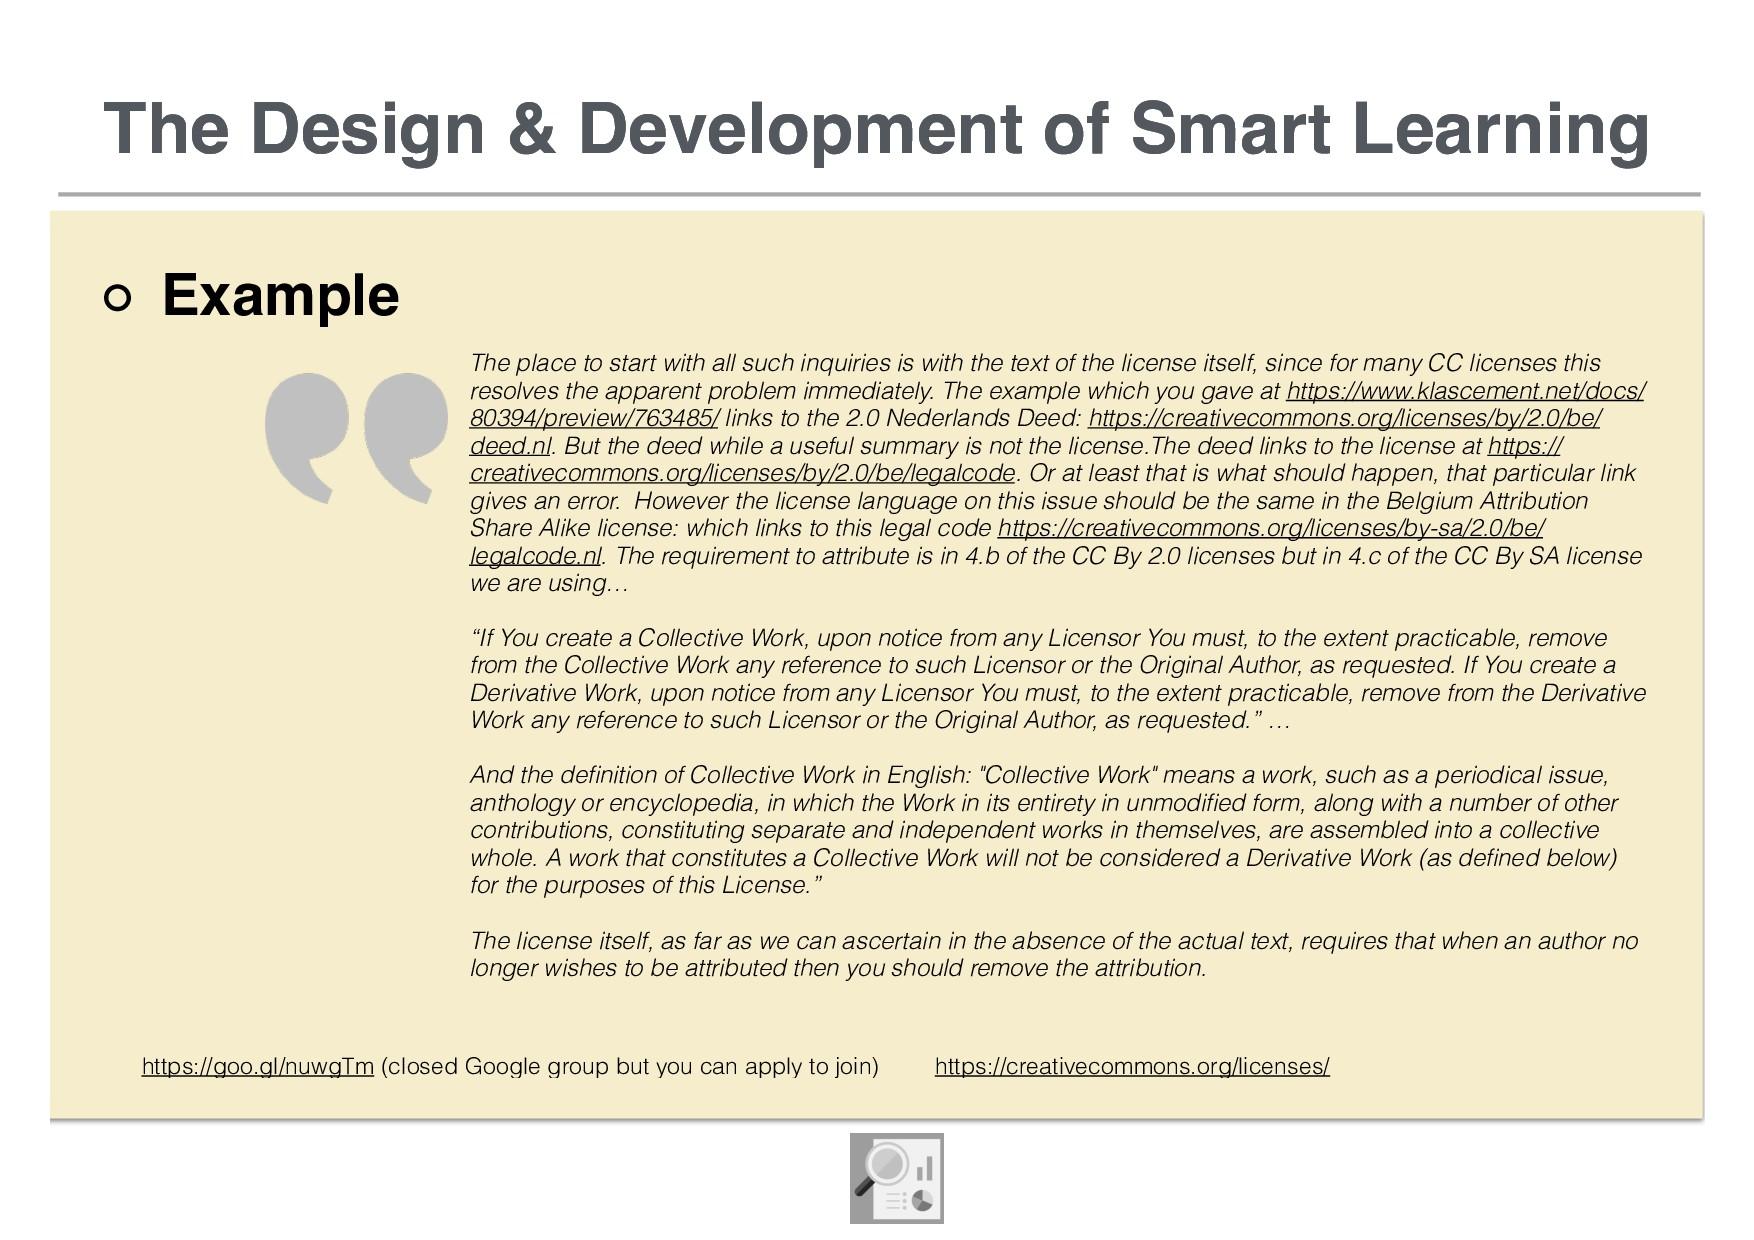 The Design & Development of Smart Learning Exam...